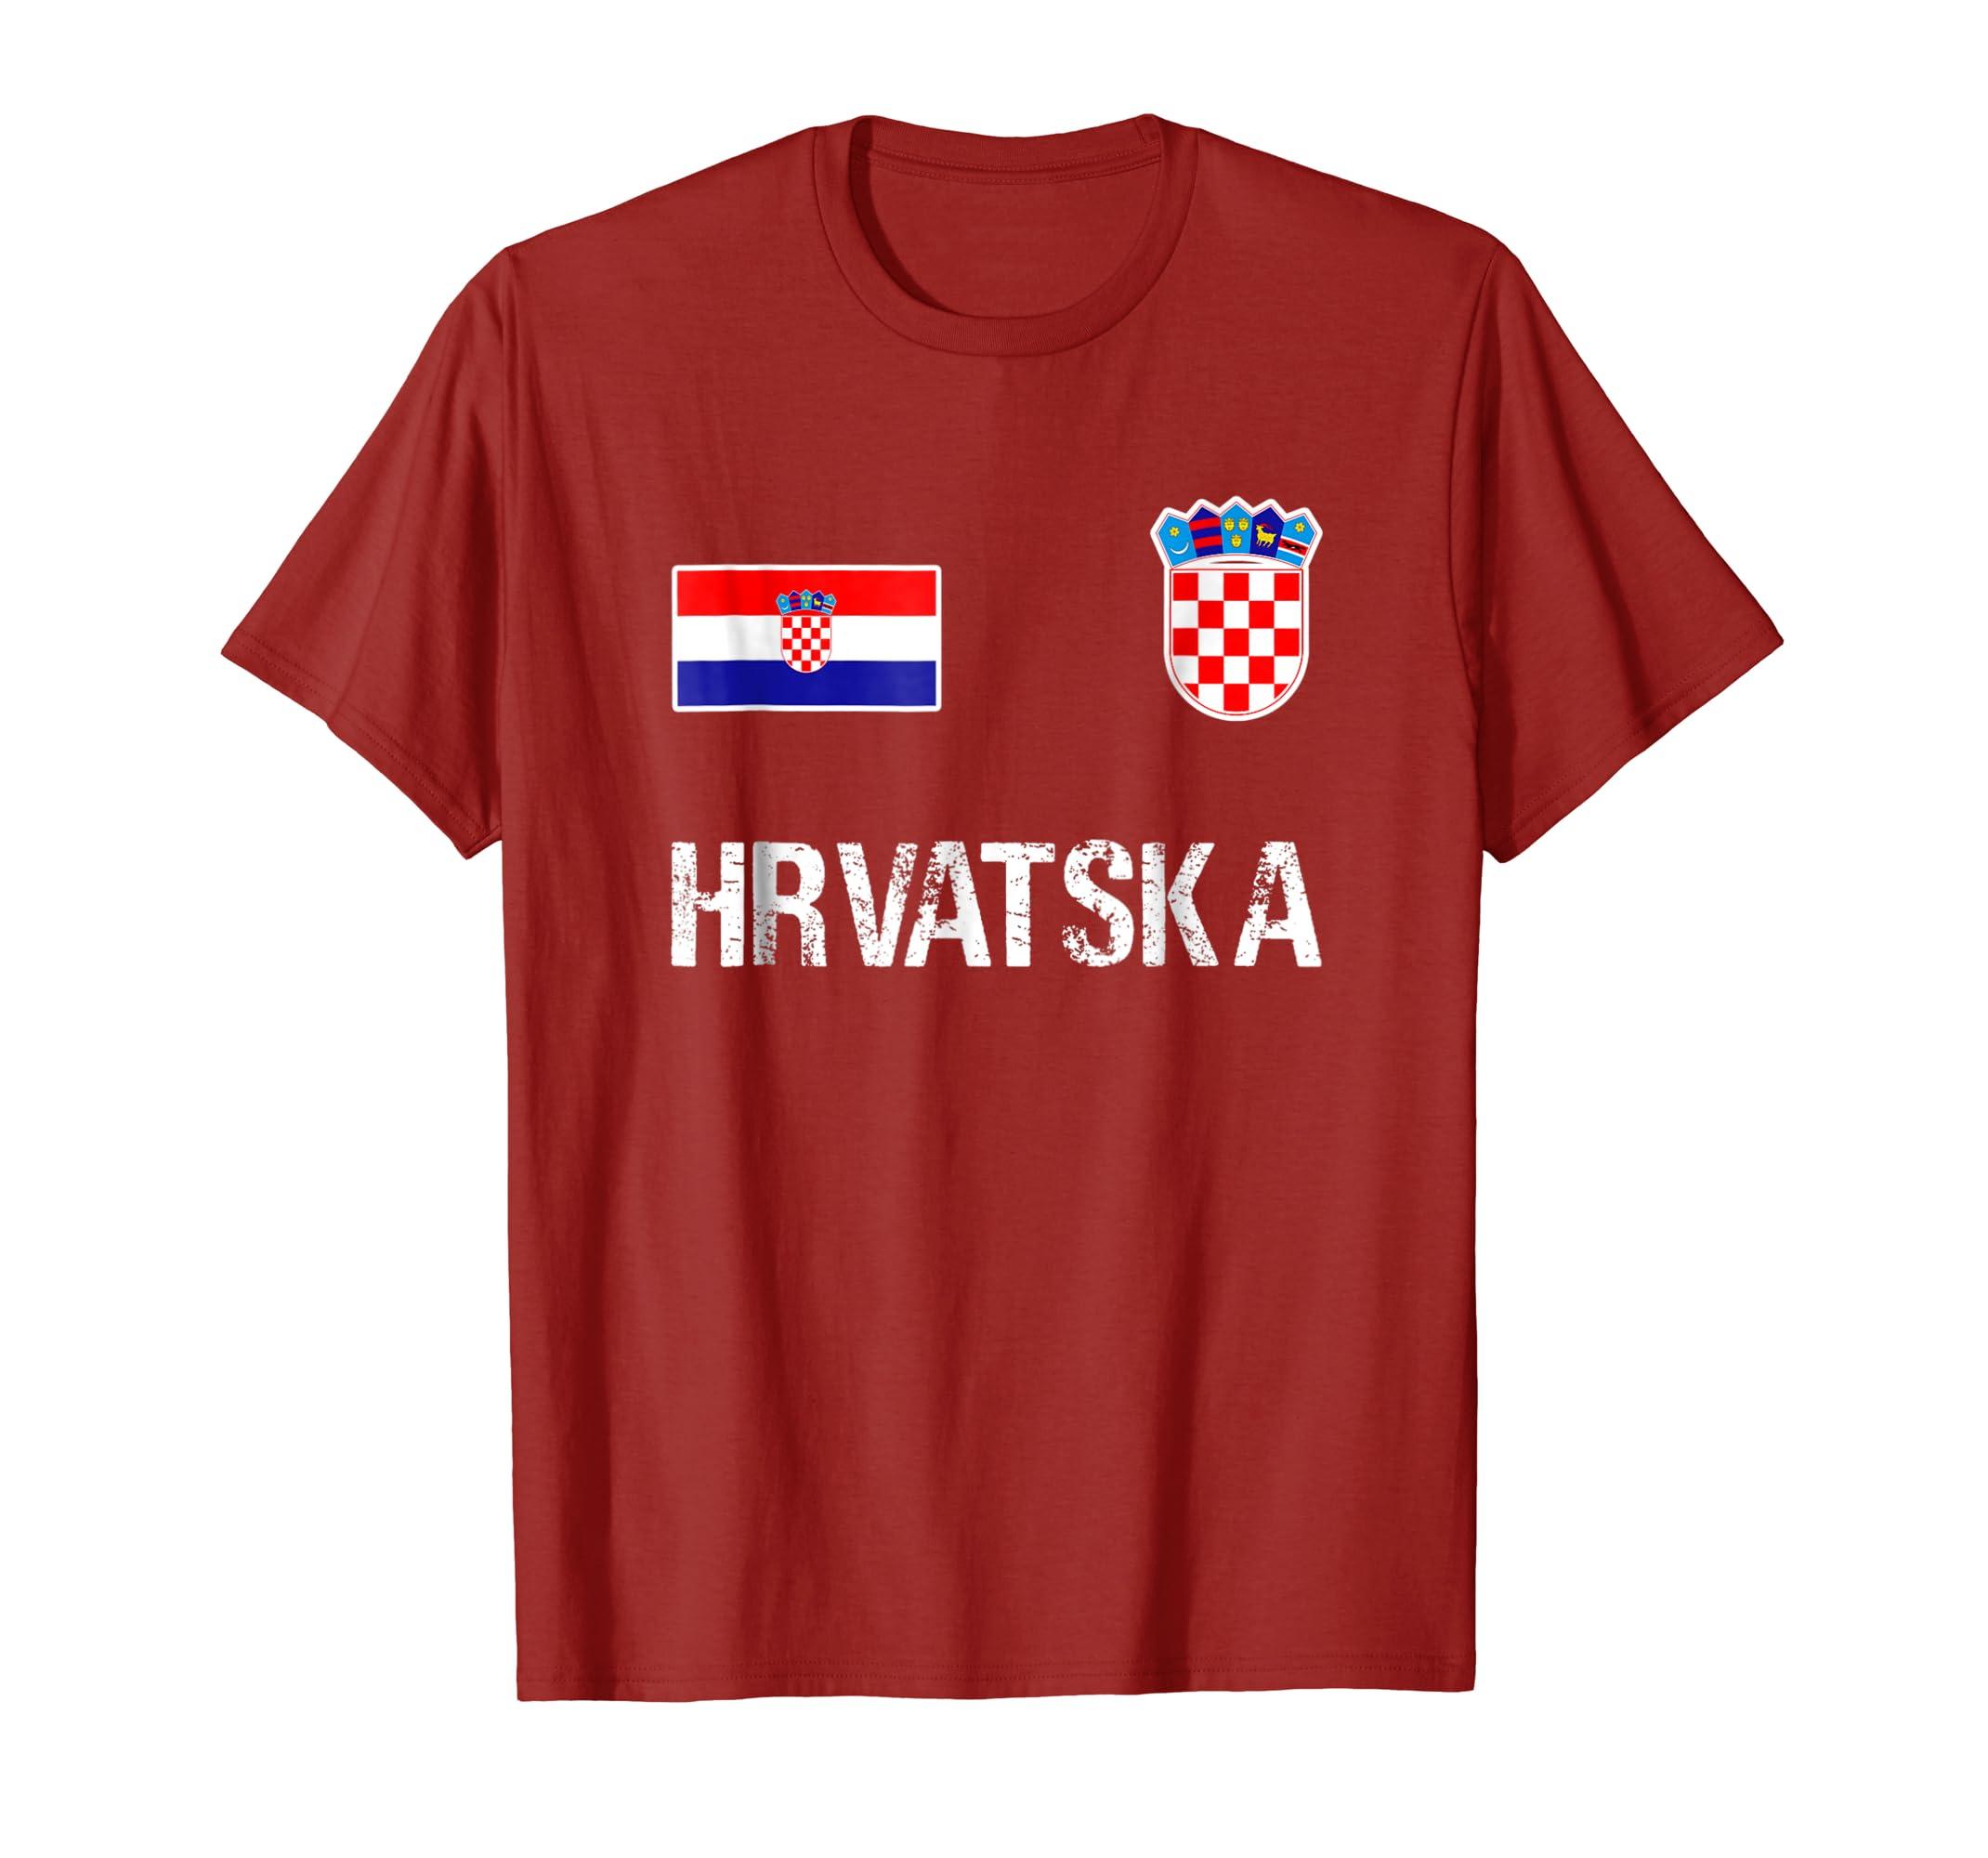 12265af3f Hrvatska T-shirt Croatian Flag Hrvatska Soccer Jersey Style-ln – Lntee